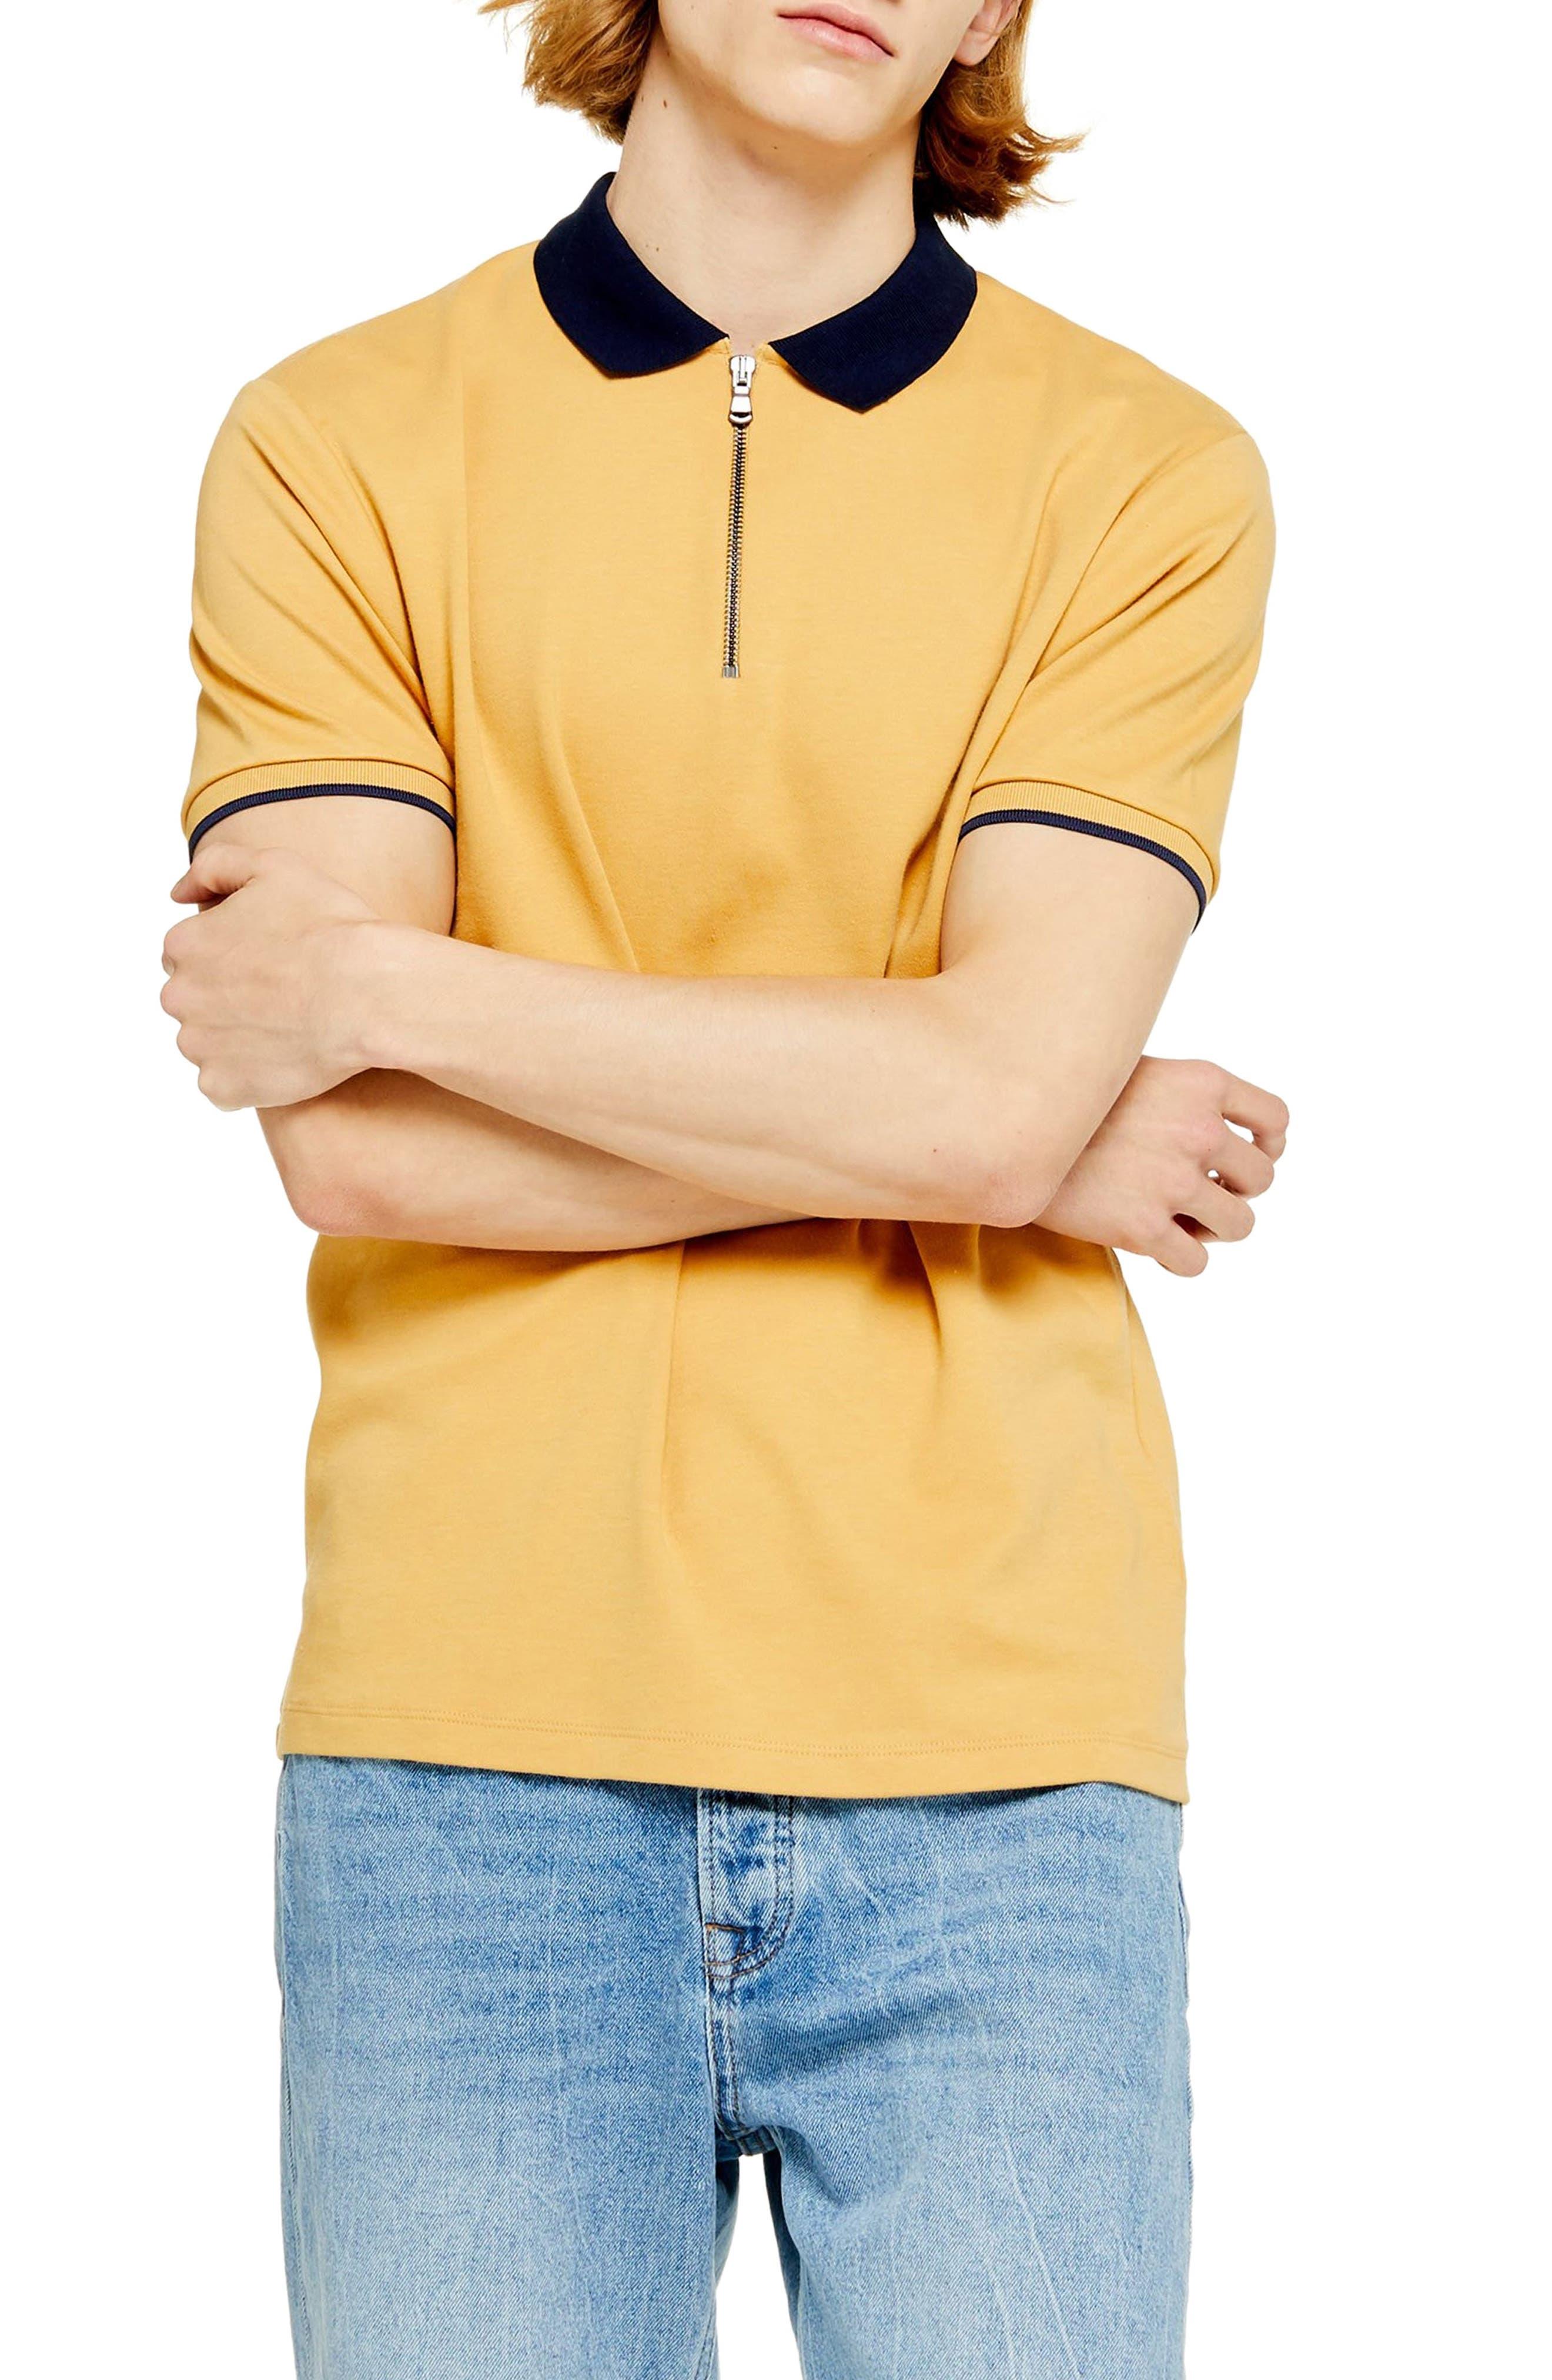 1960s – 70s Mens Shirts- Disco Shirts, Hippie Shirts Mens Topman Interlock Zip Polo $24.00 AT vintagedancer.com